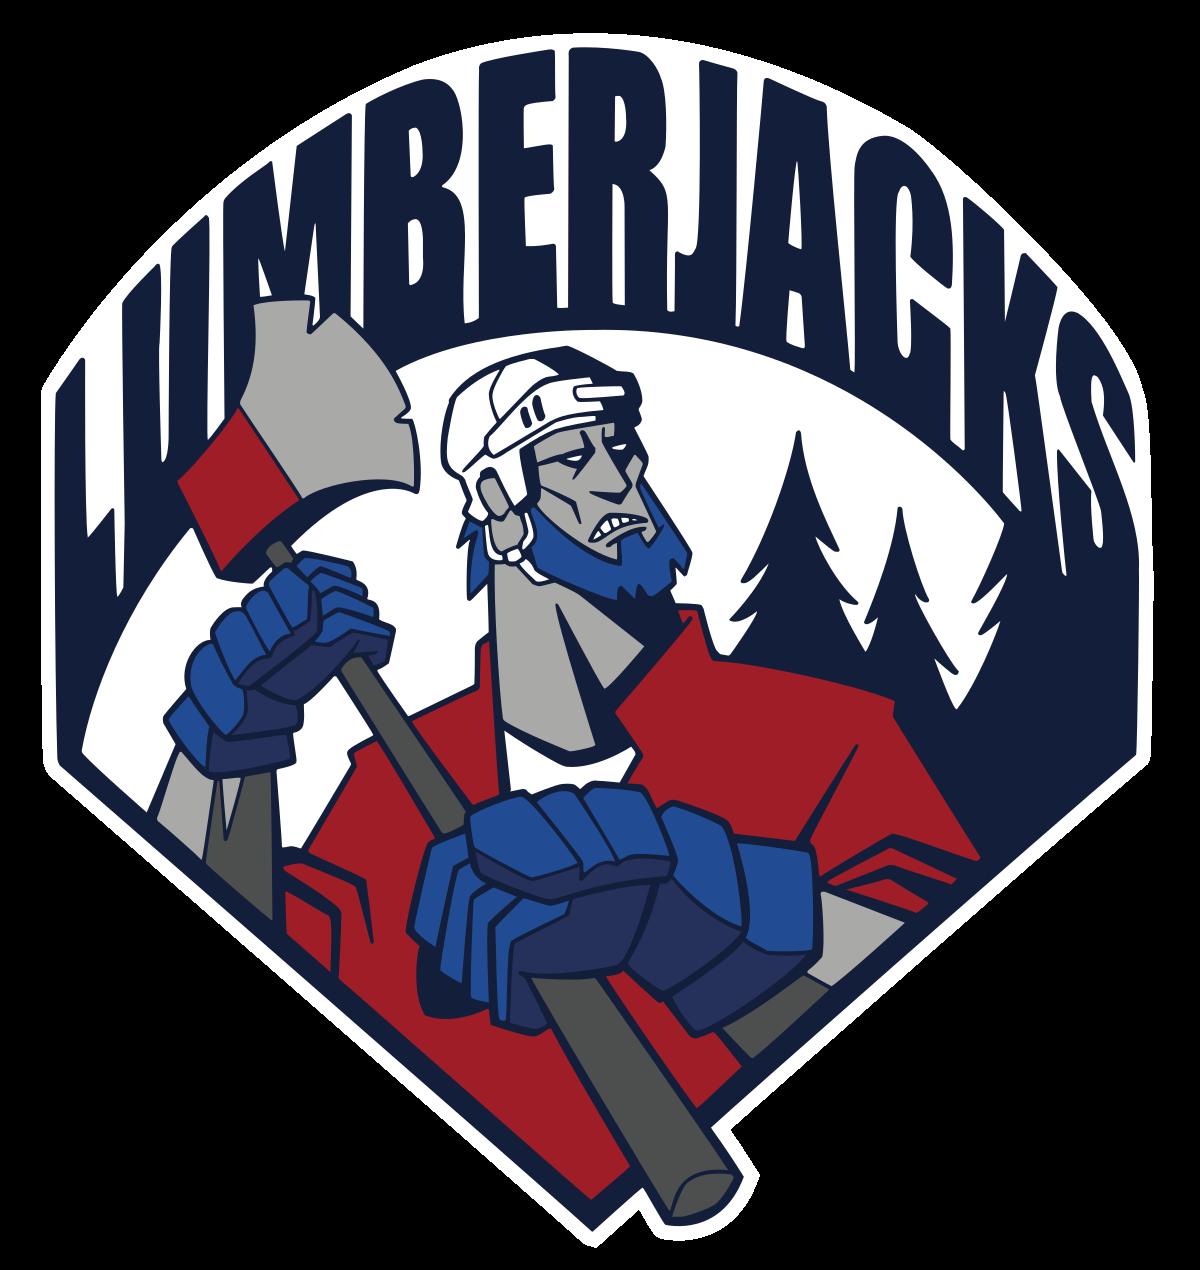 South shore lumberjacks wikipedia. Lumberjack clipart printable